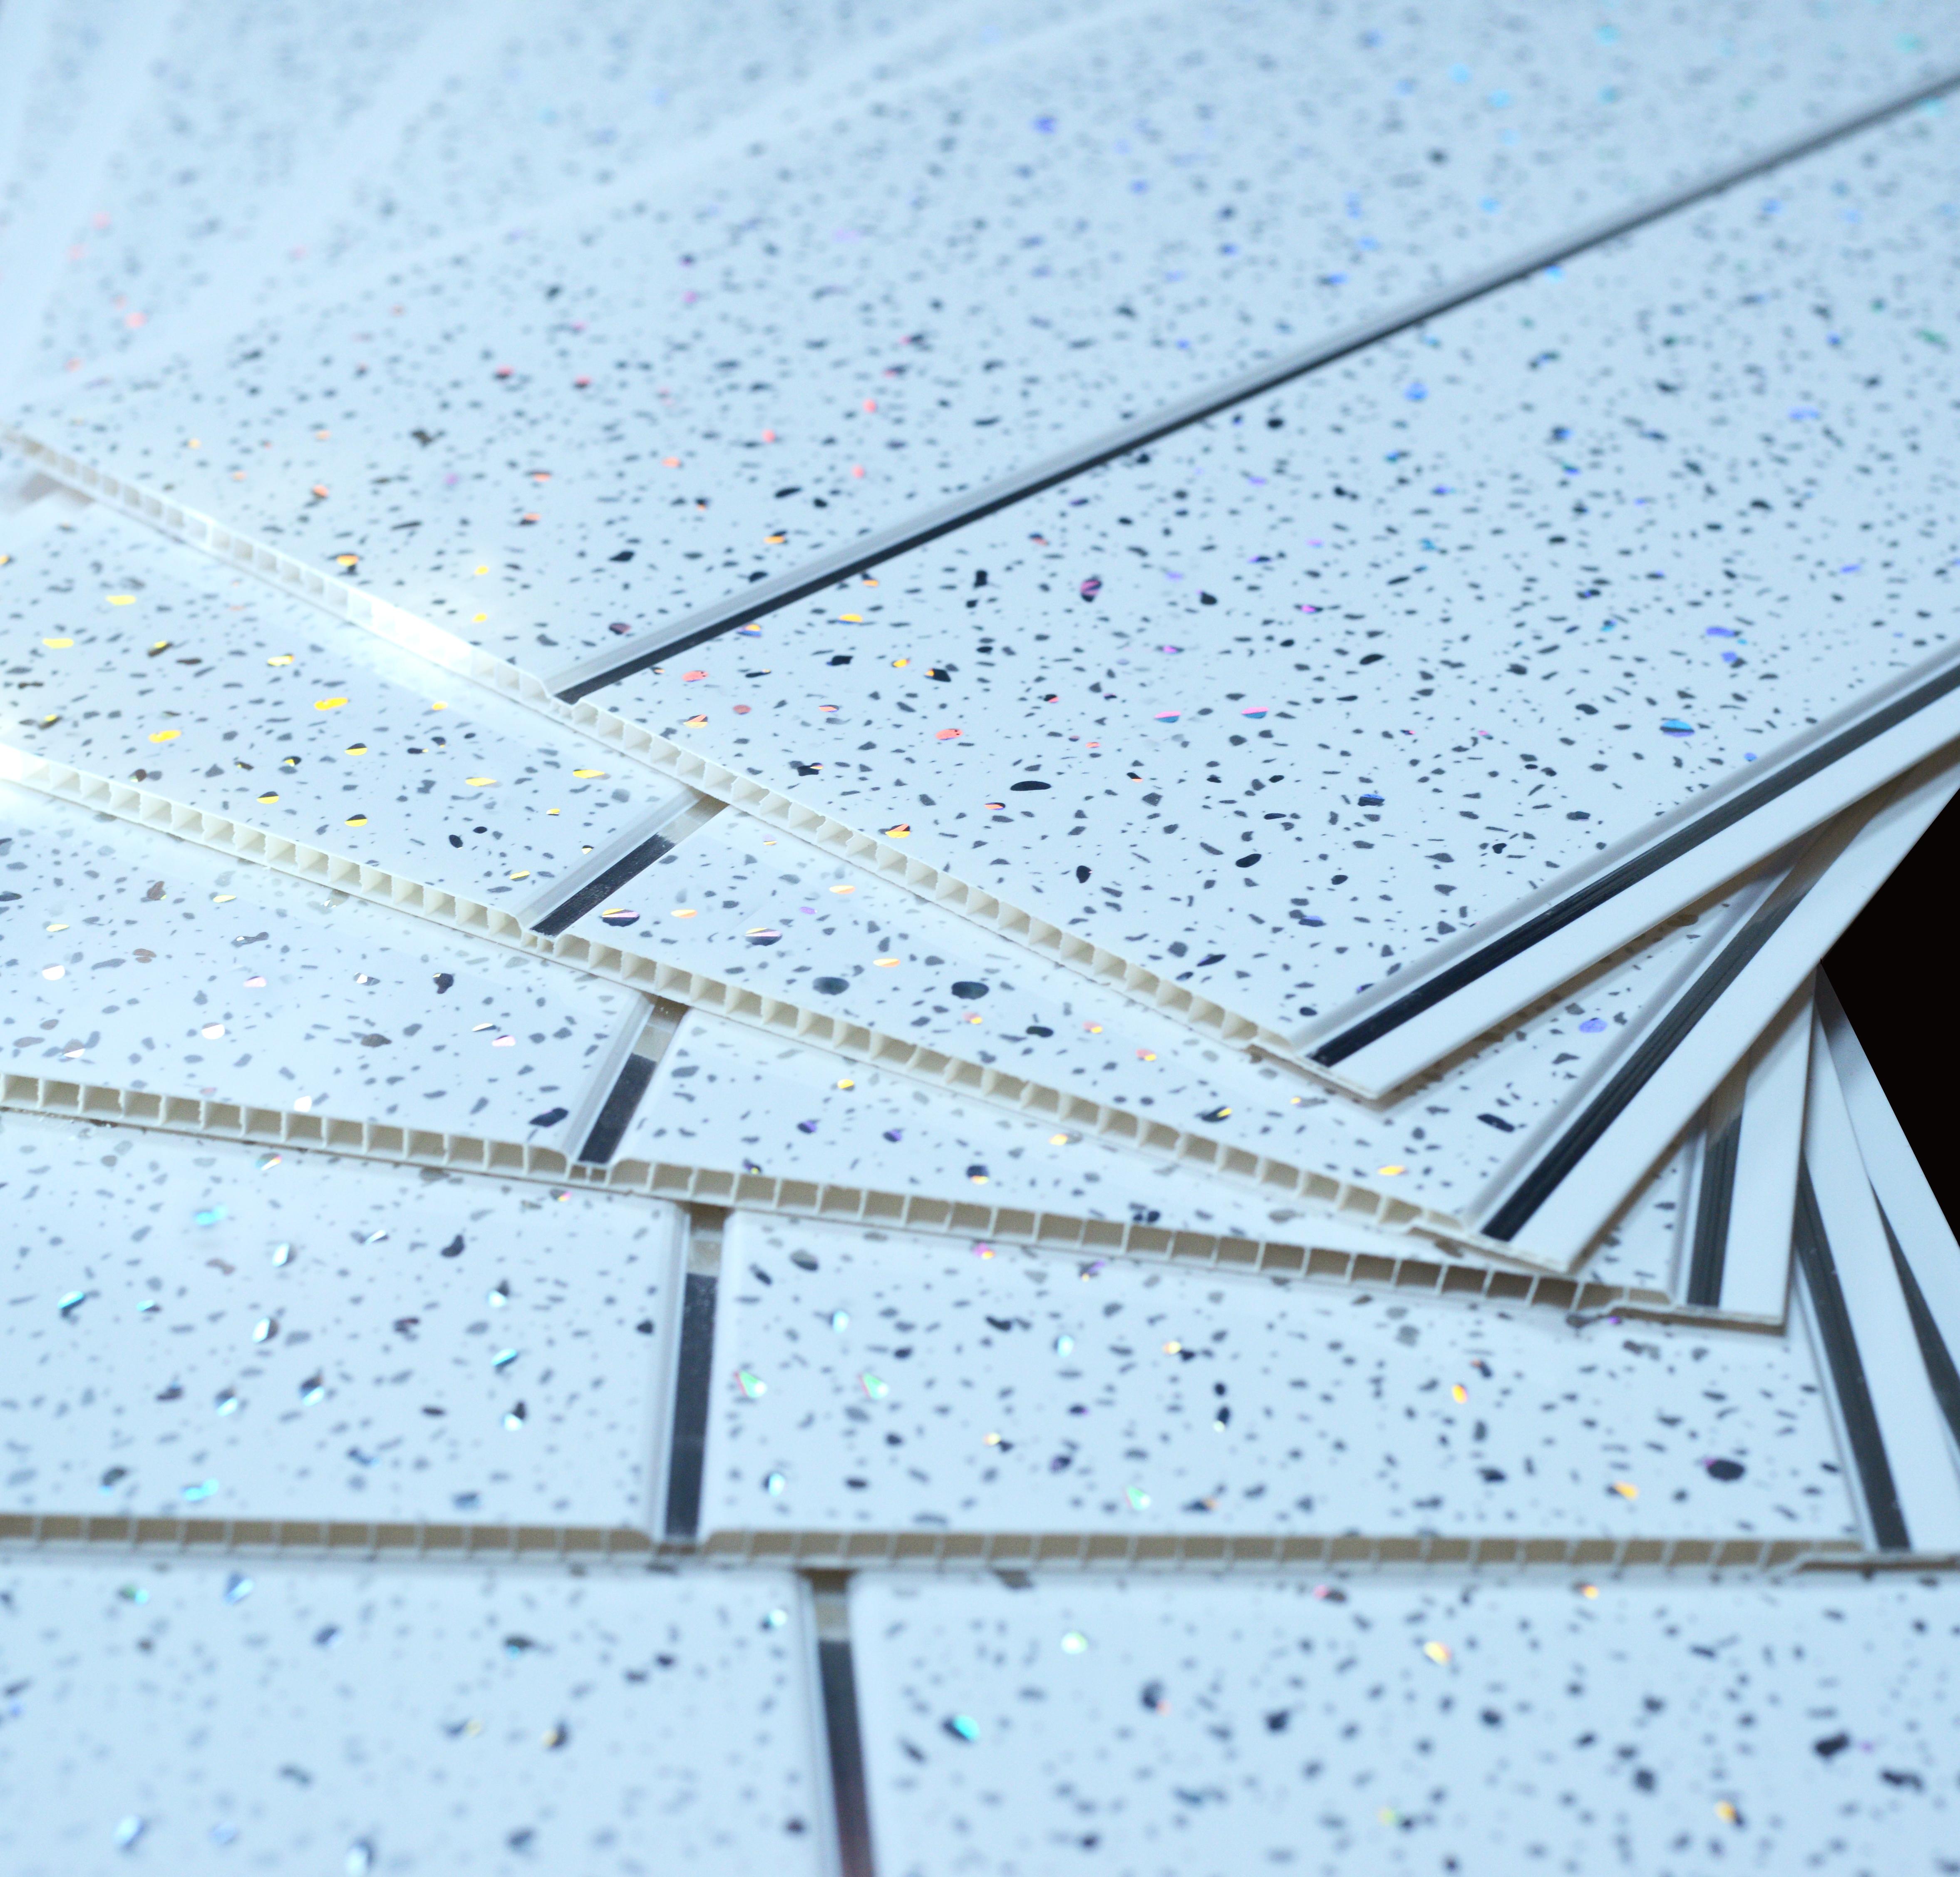 Details about Platinum White Sparkle Chrome Glitter Wall & Ceiling Panels PVC Shower Cladding